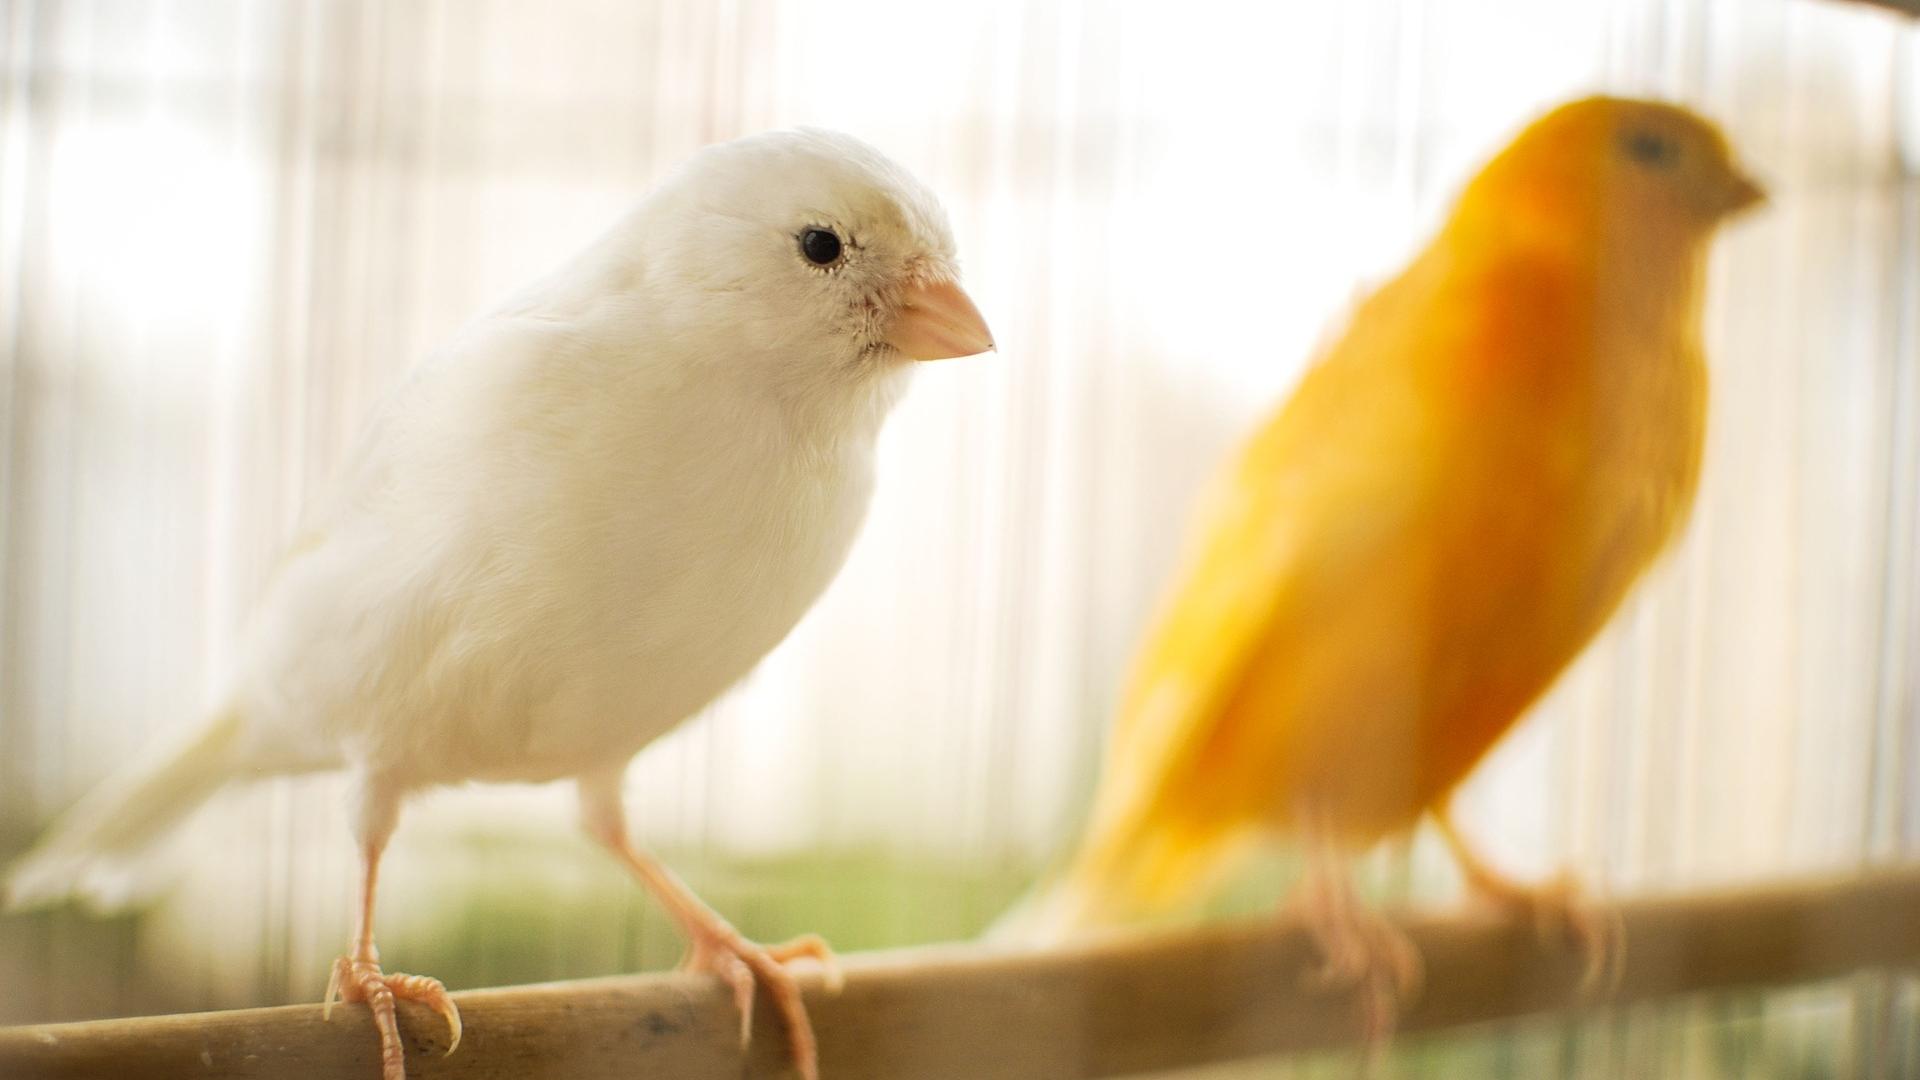 bird-2871833_1920.jpg